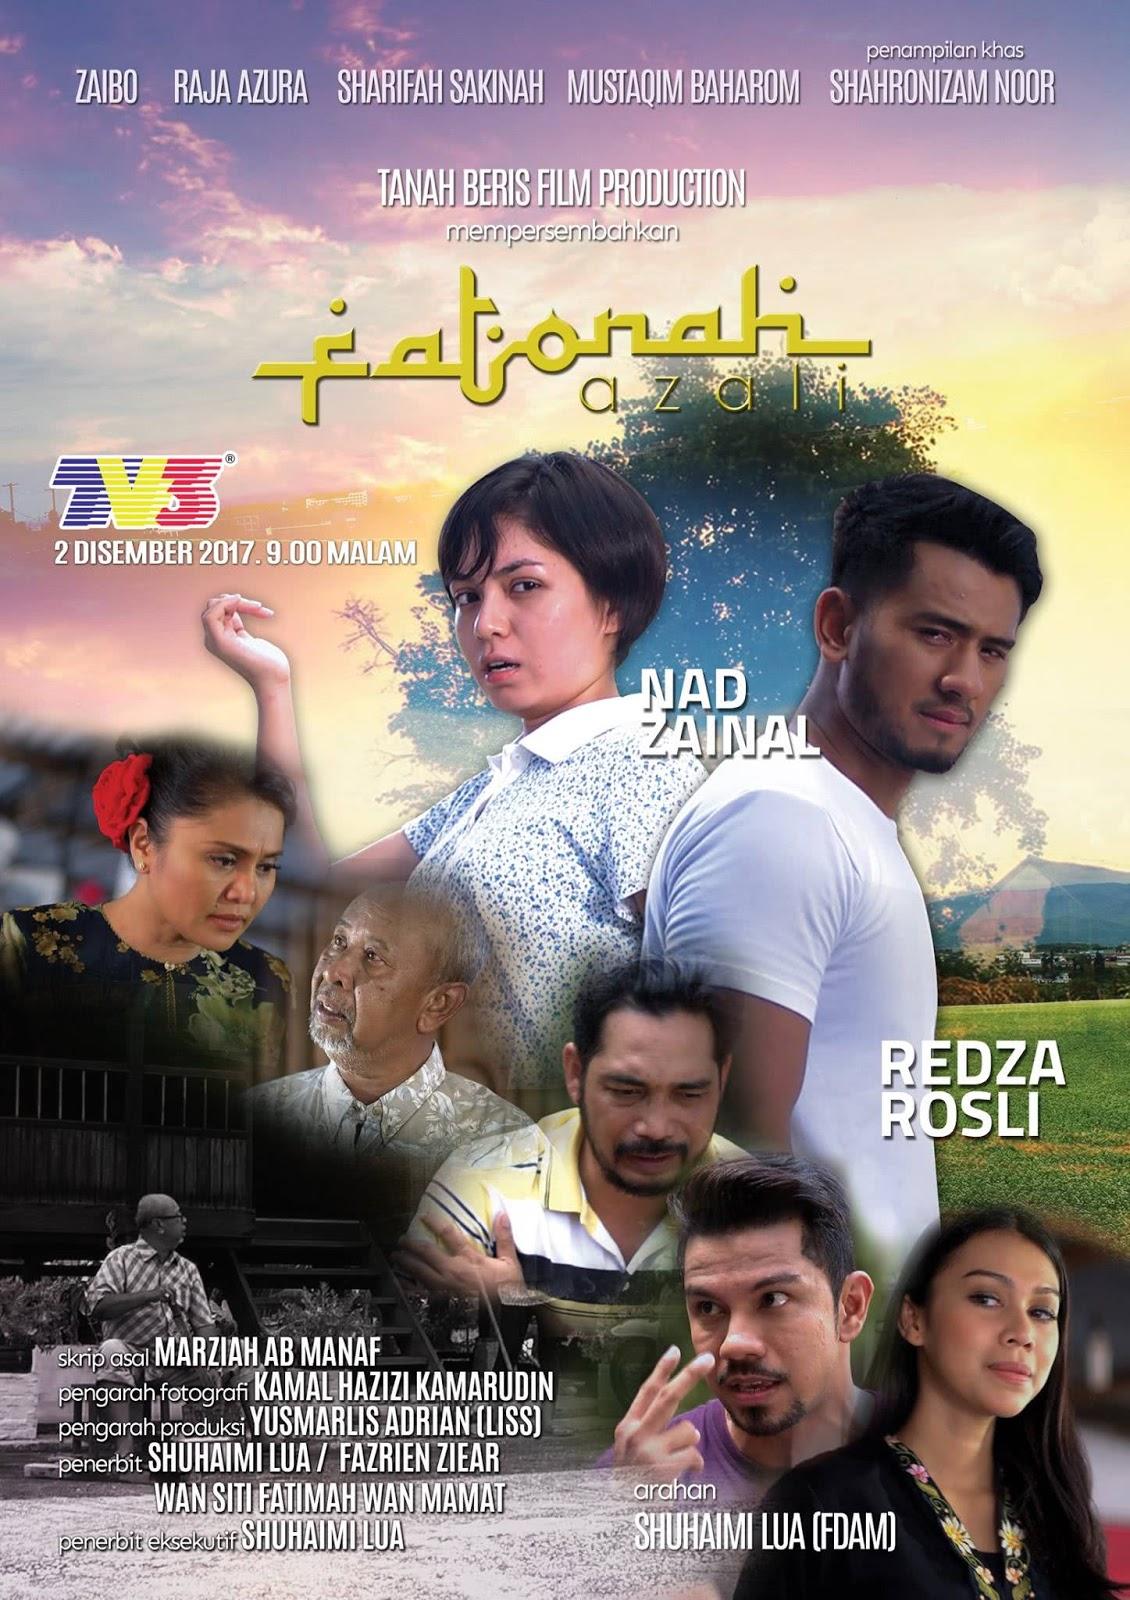 Sinopsis Telemovie Fatonah Azali